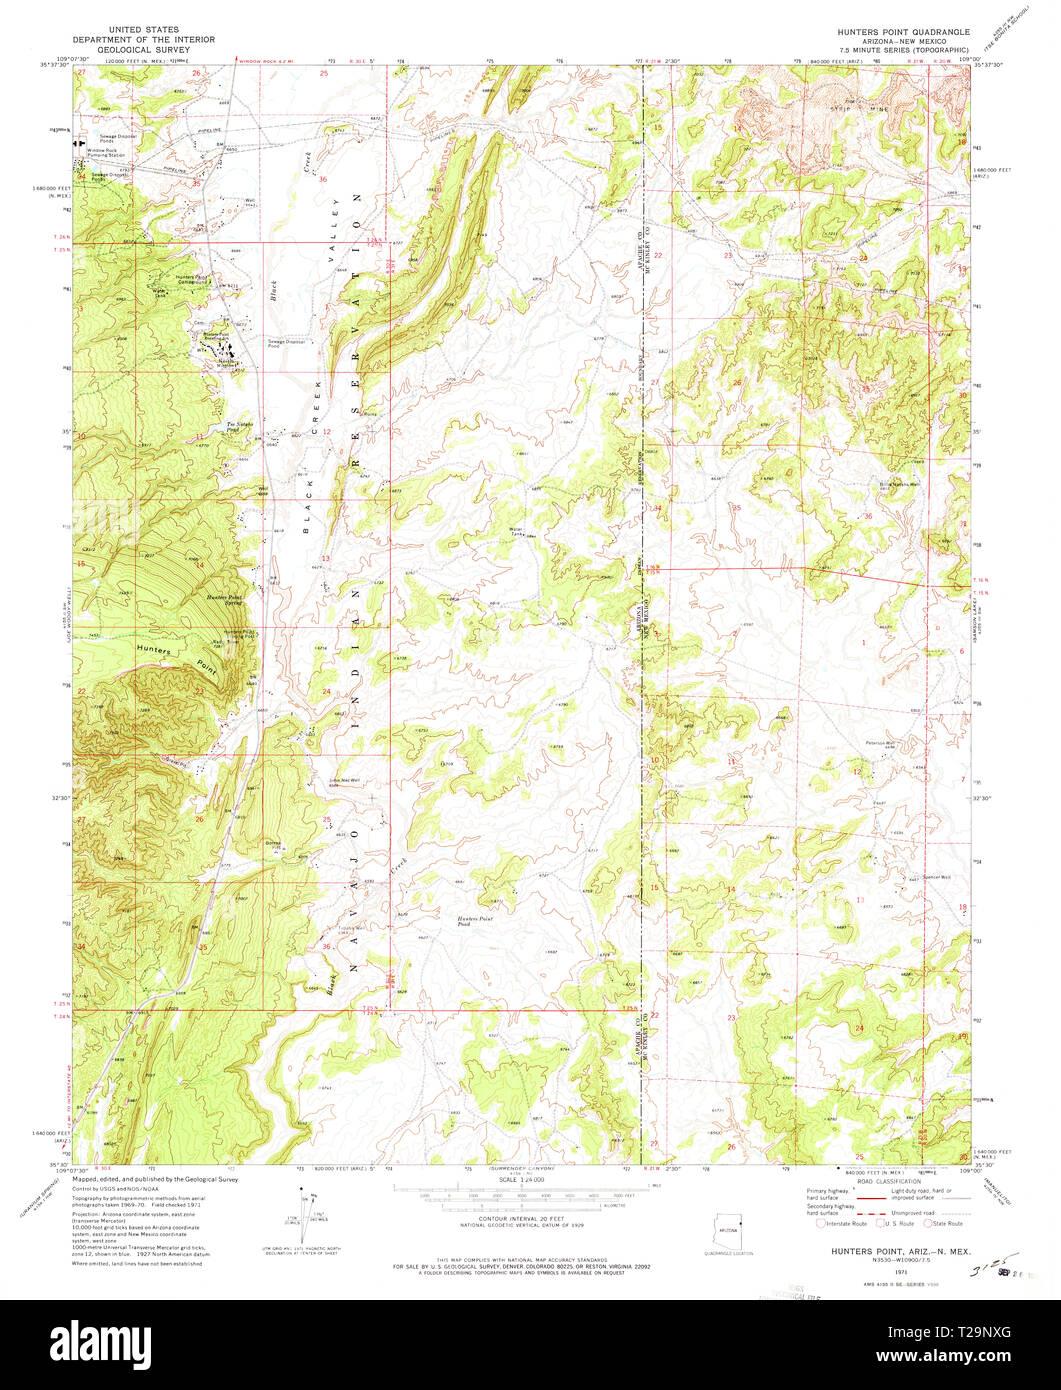 Map Of Arizona 1858.Usgs Topo Map Arizona Az Hunters Point 311858 1971 24000 Restoration